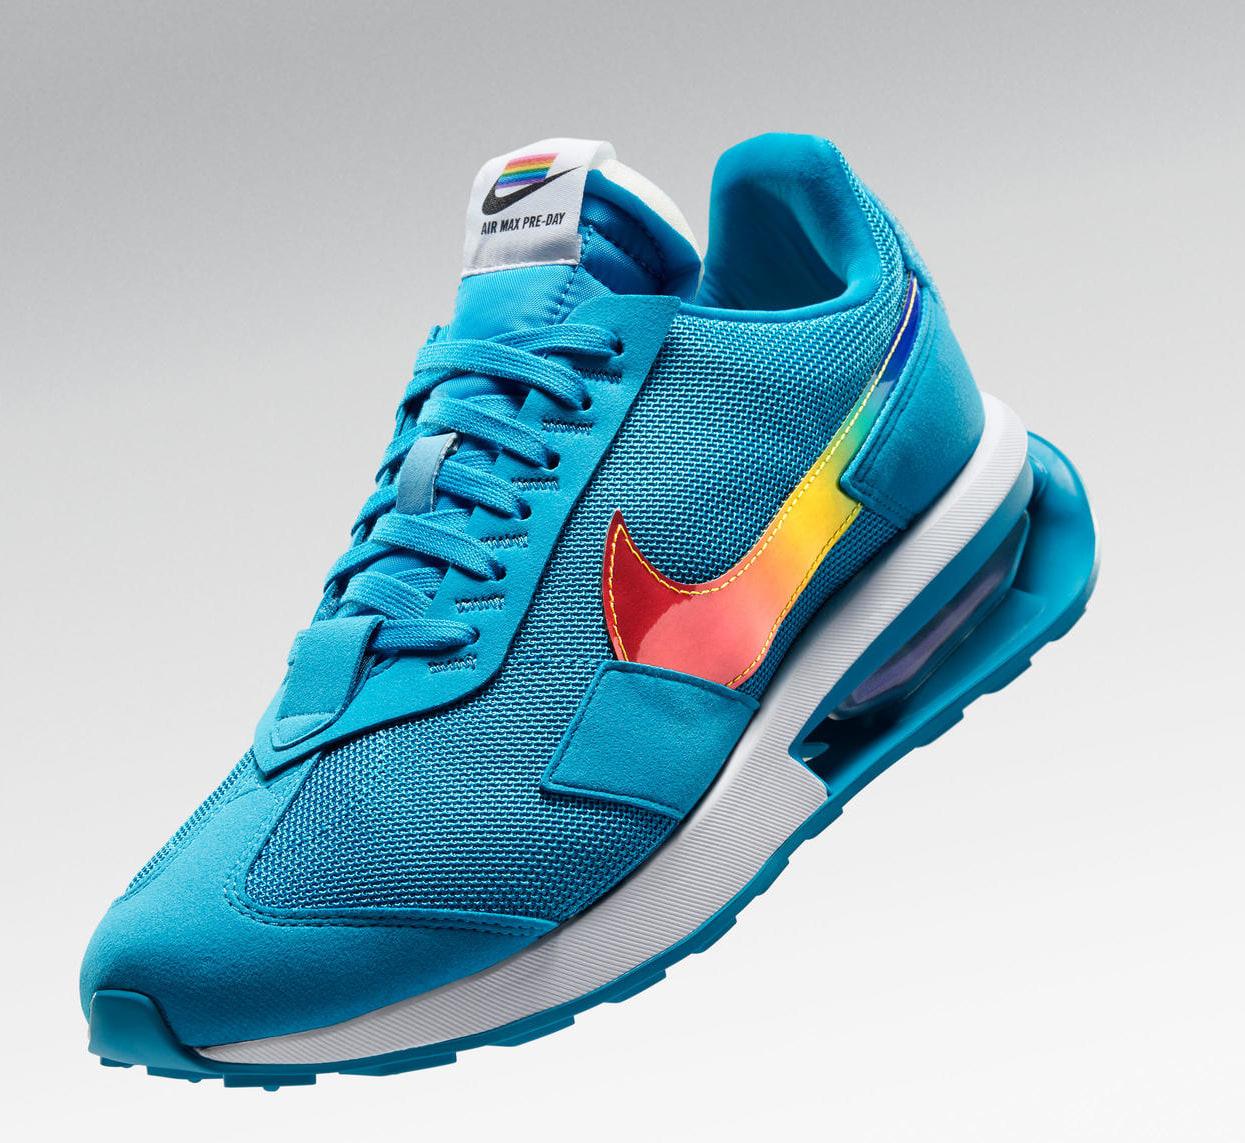 Nike Air Max Pre Day Be True 2021